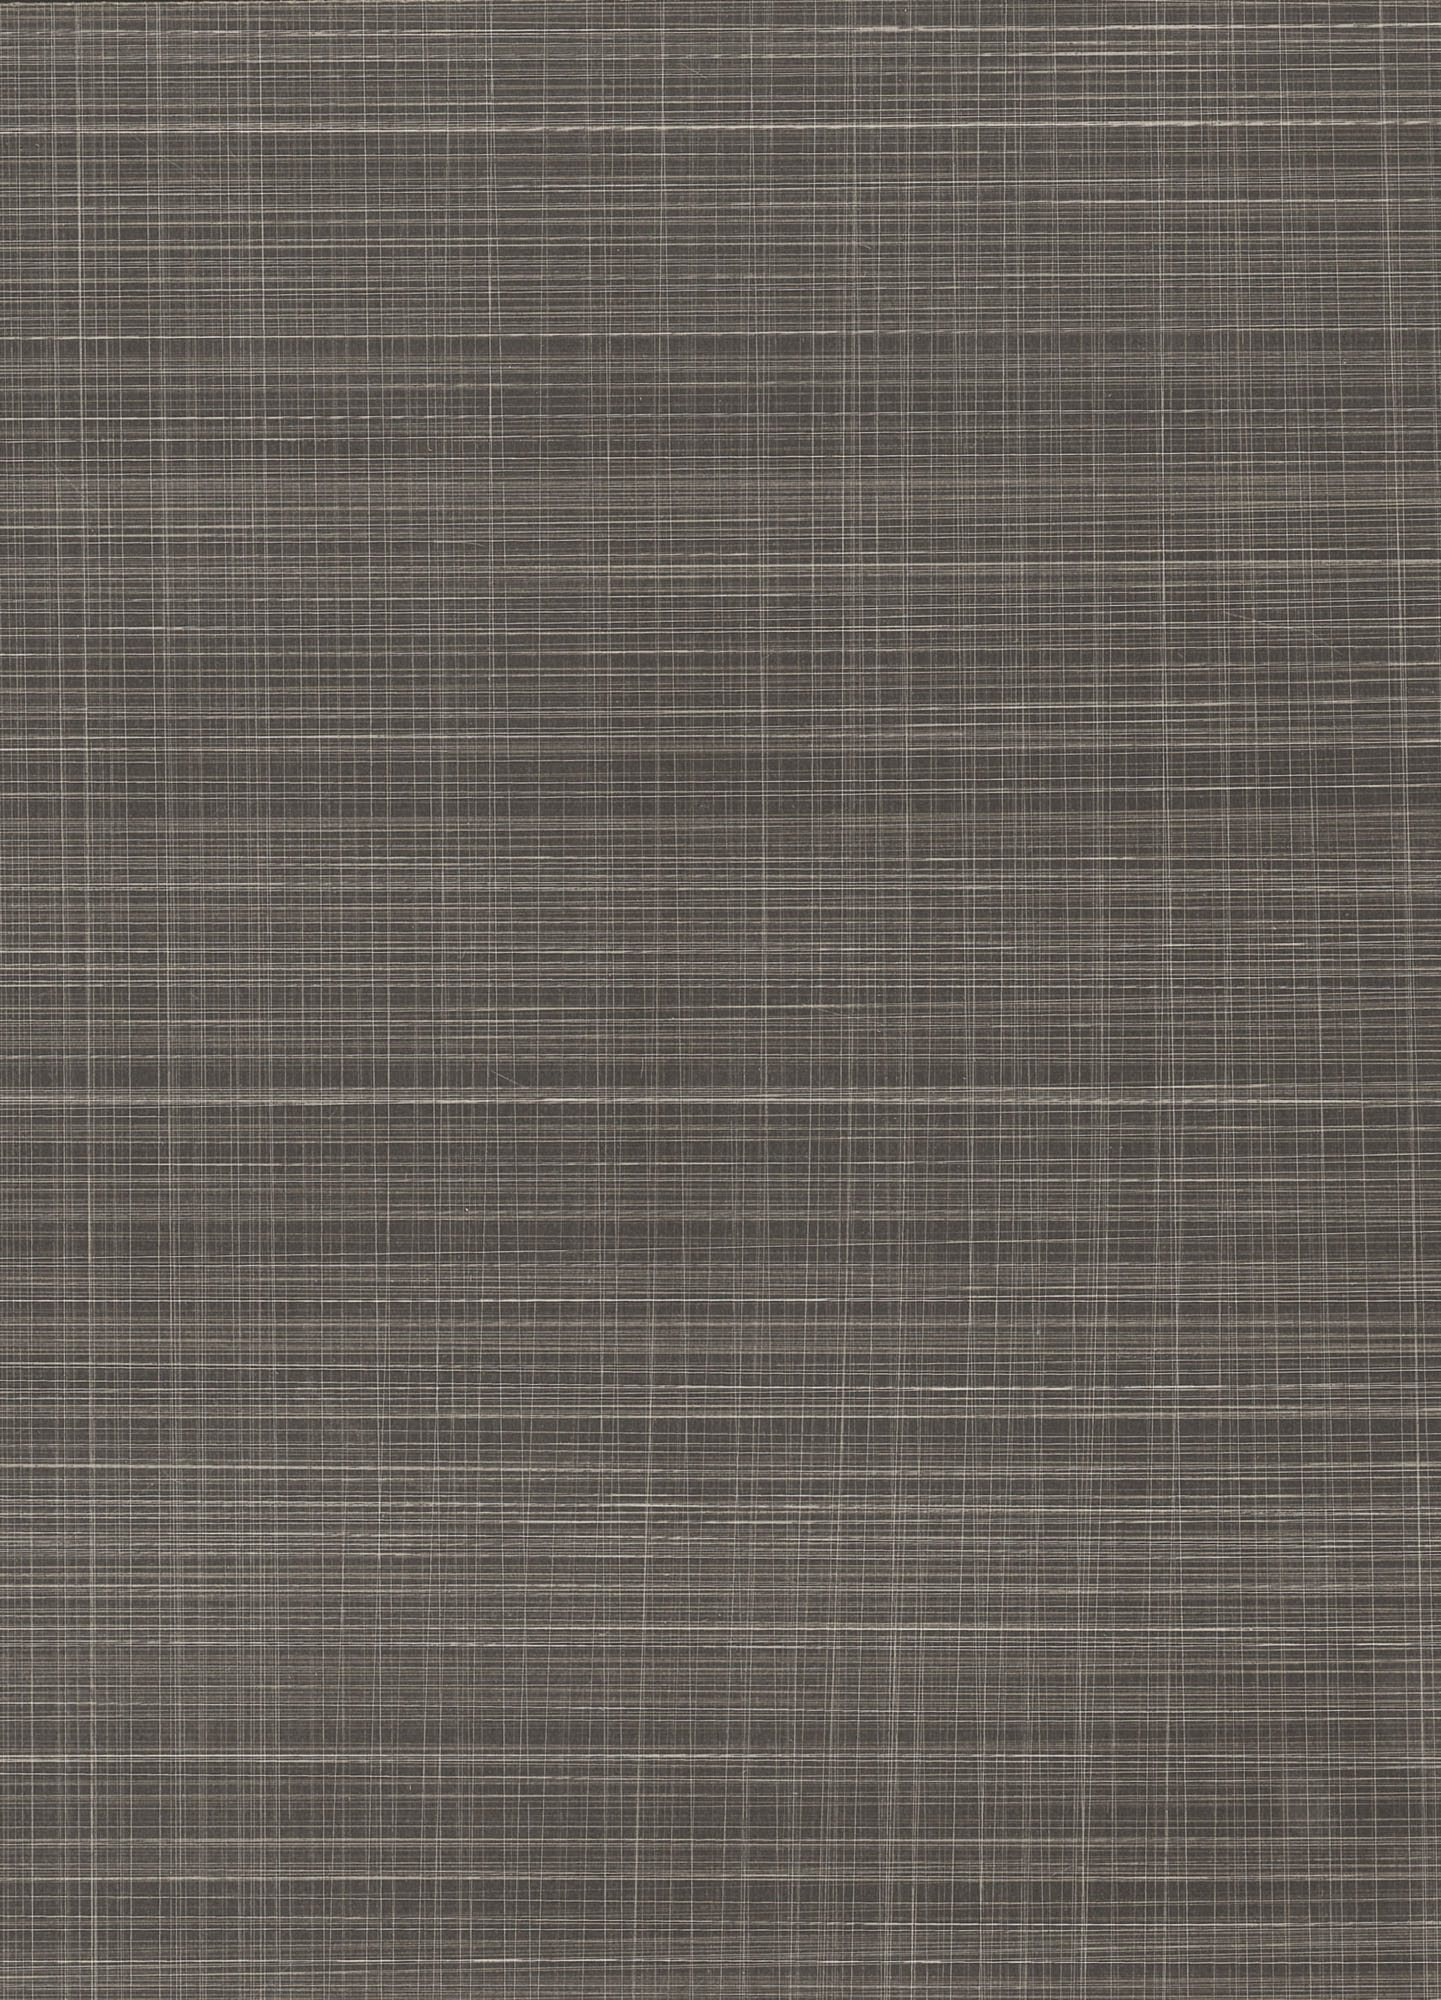 M5391 Graphite Veil